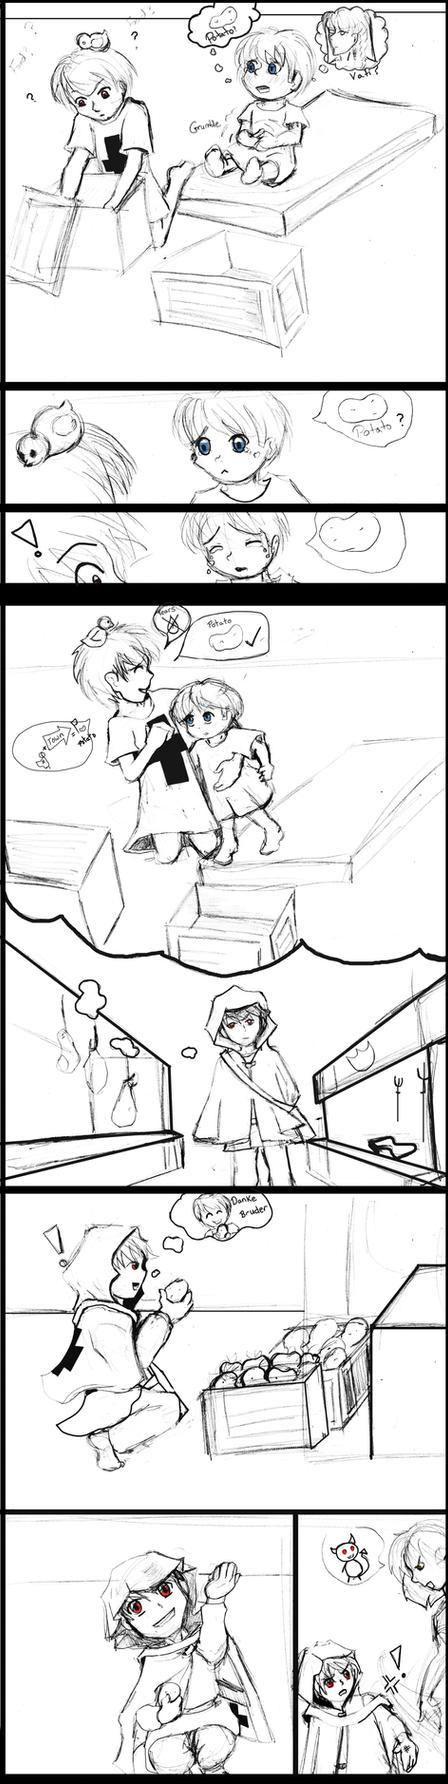 Gilbert and Ludwig APH: Sketch Comic- Page 1 by Kiggystar